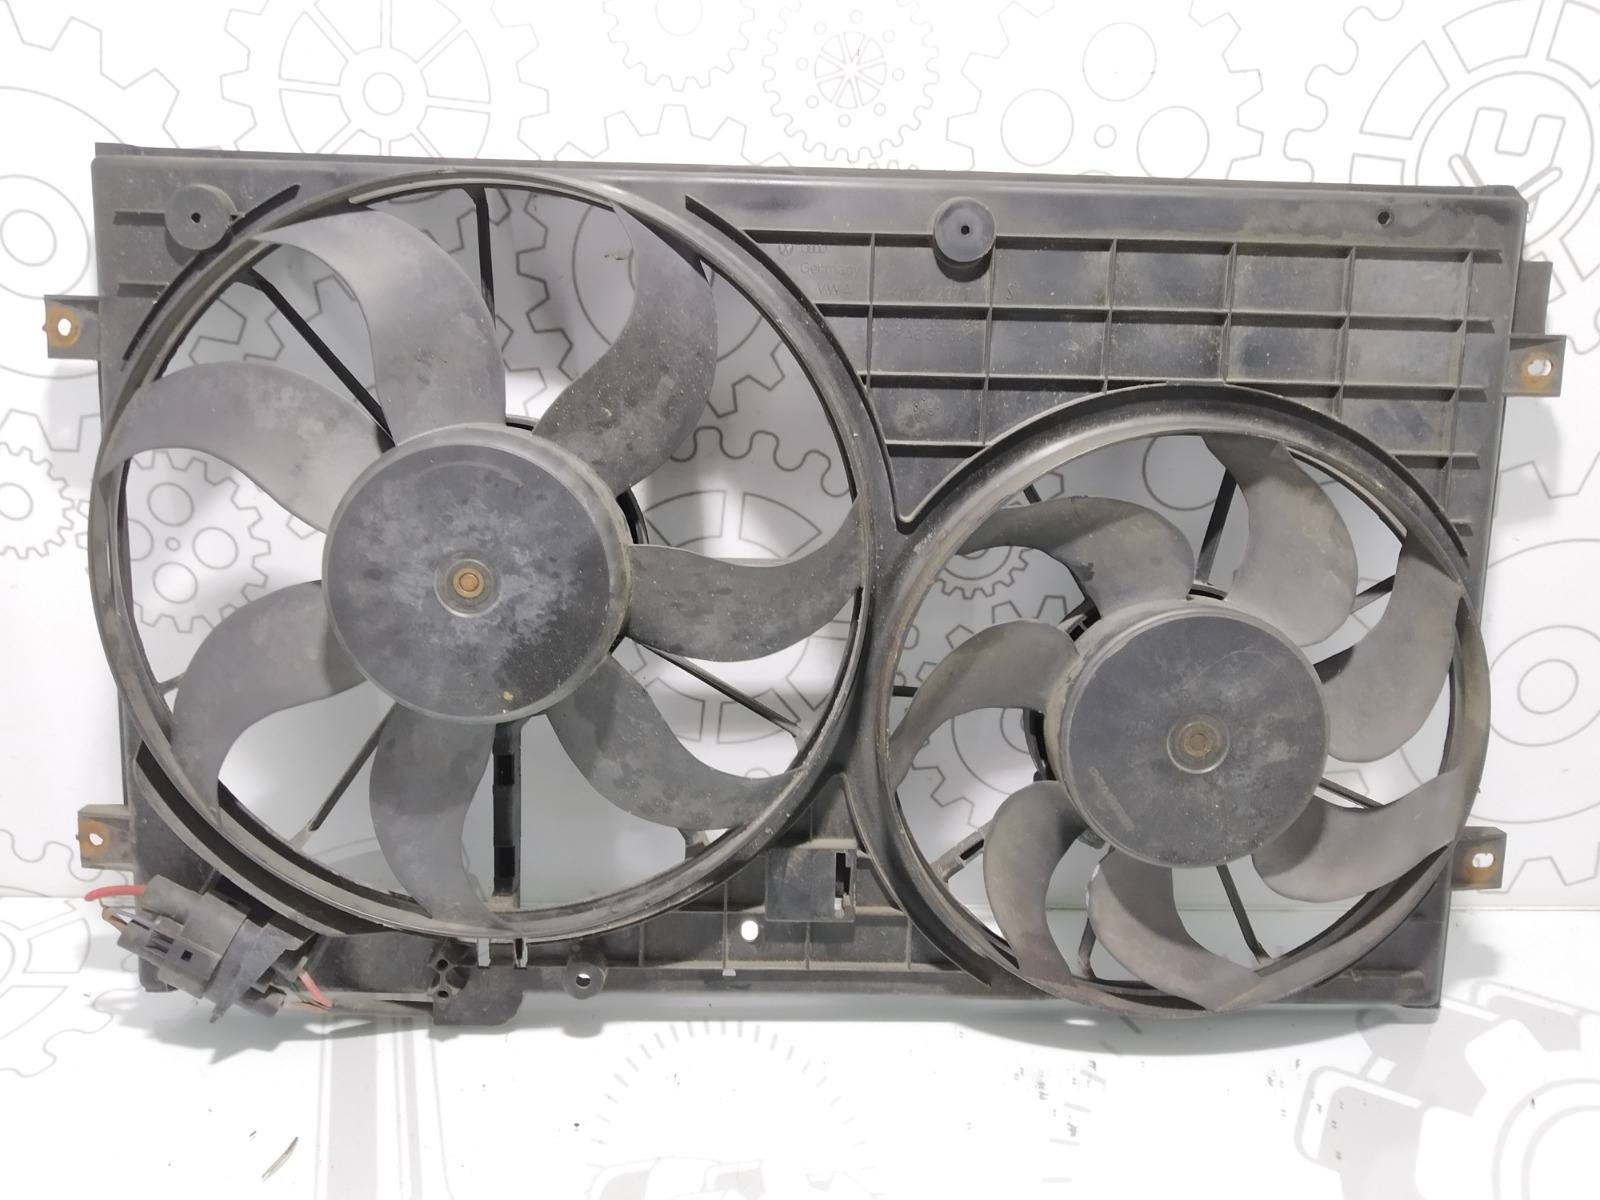 Вентилятор радиатора Skoda Octavia 1.9 TDI 2005 (б/у)